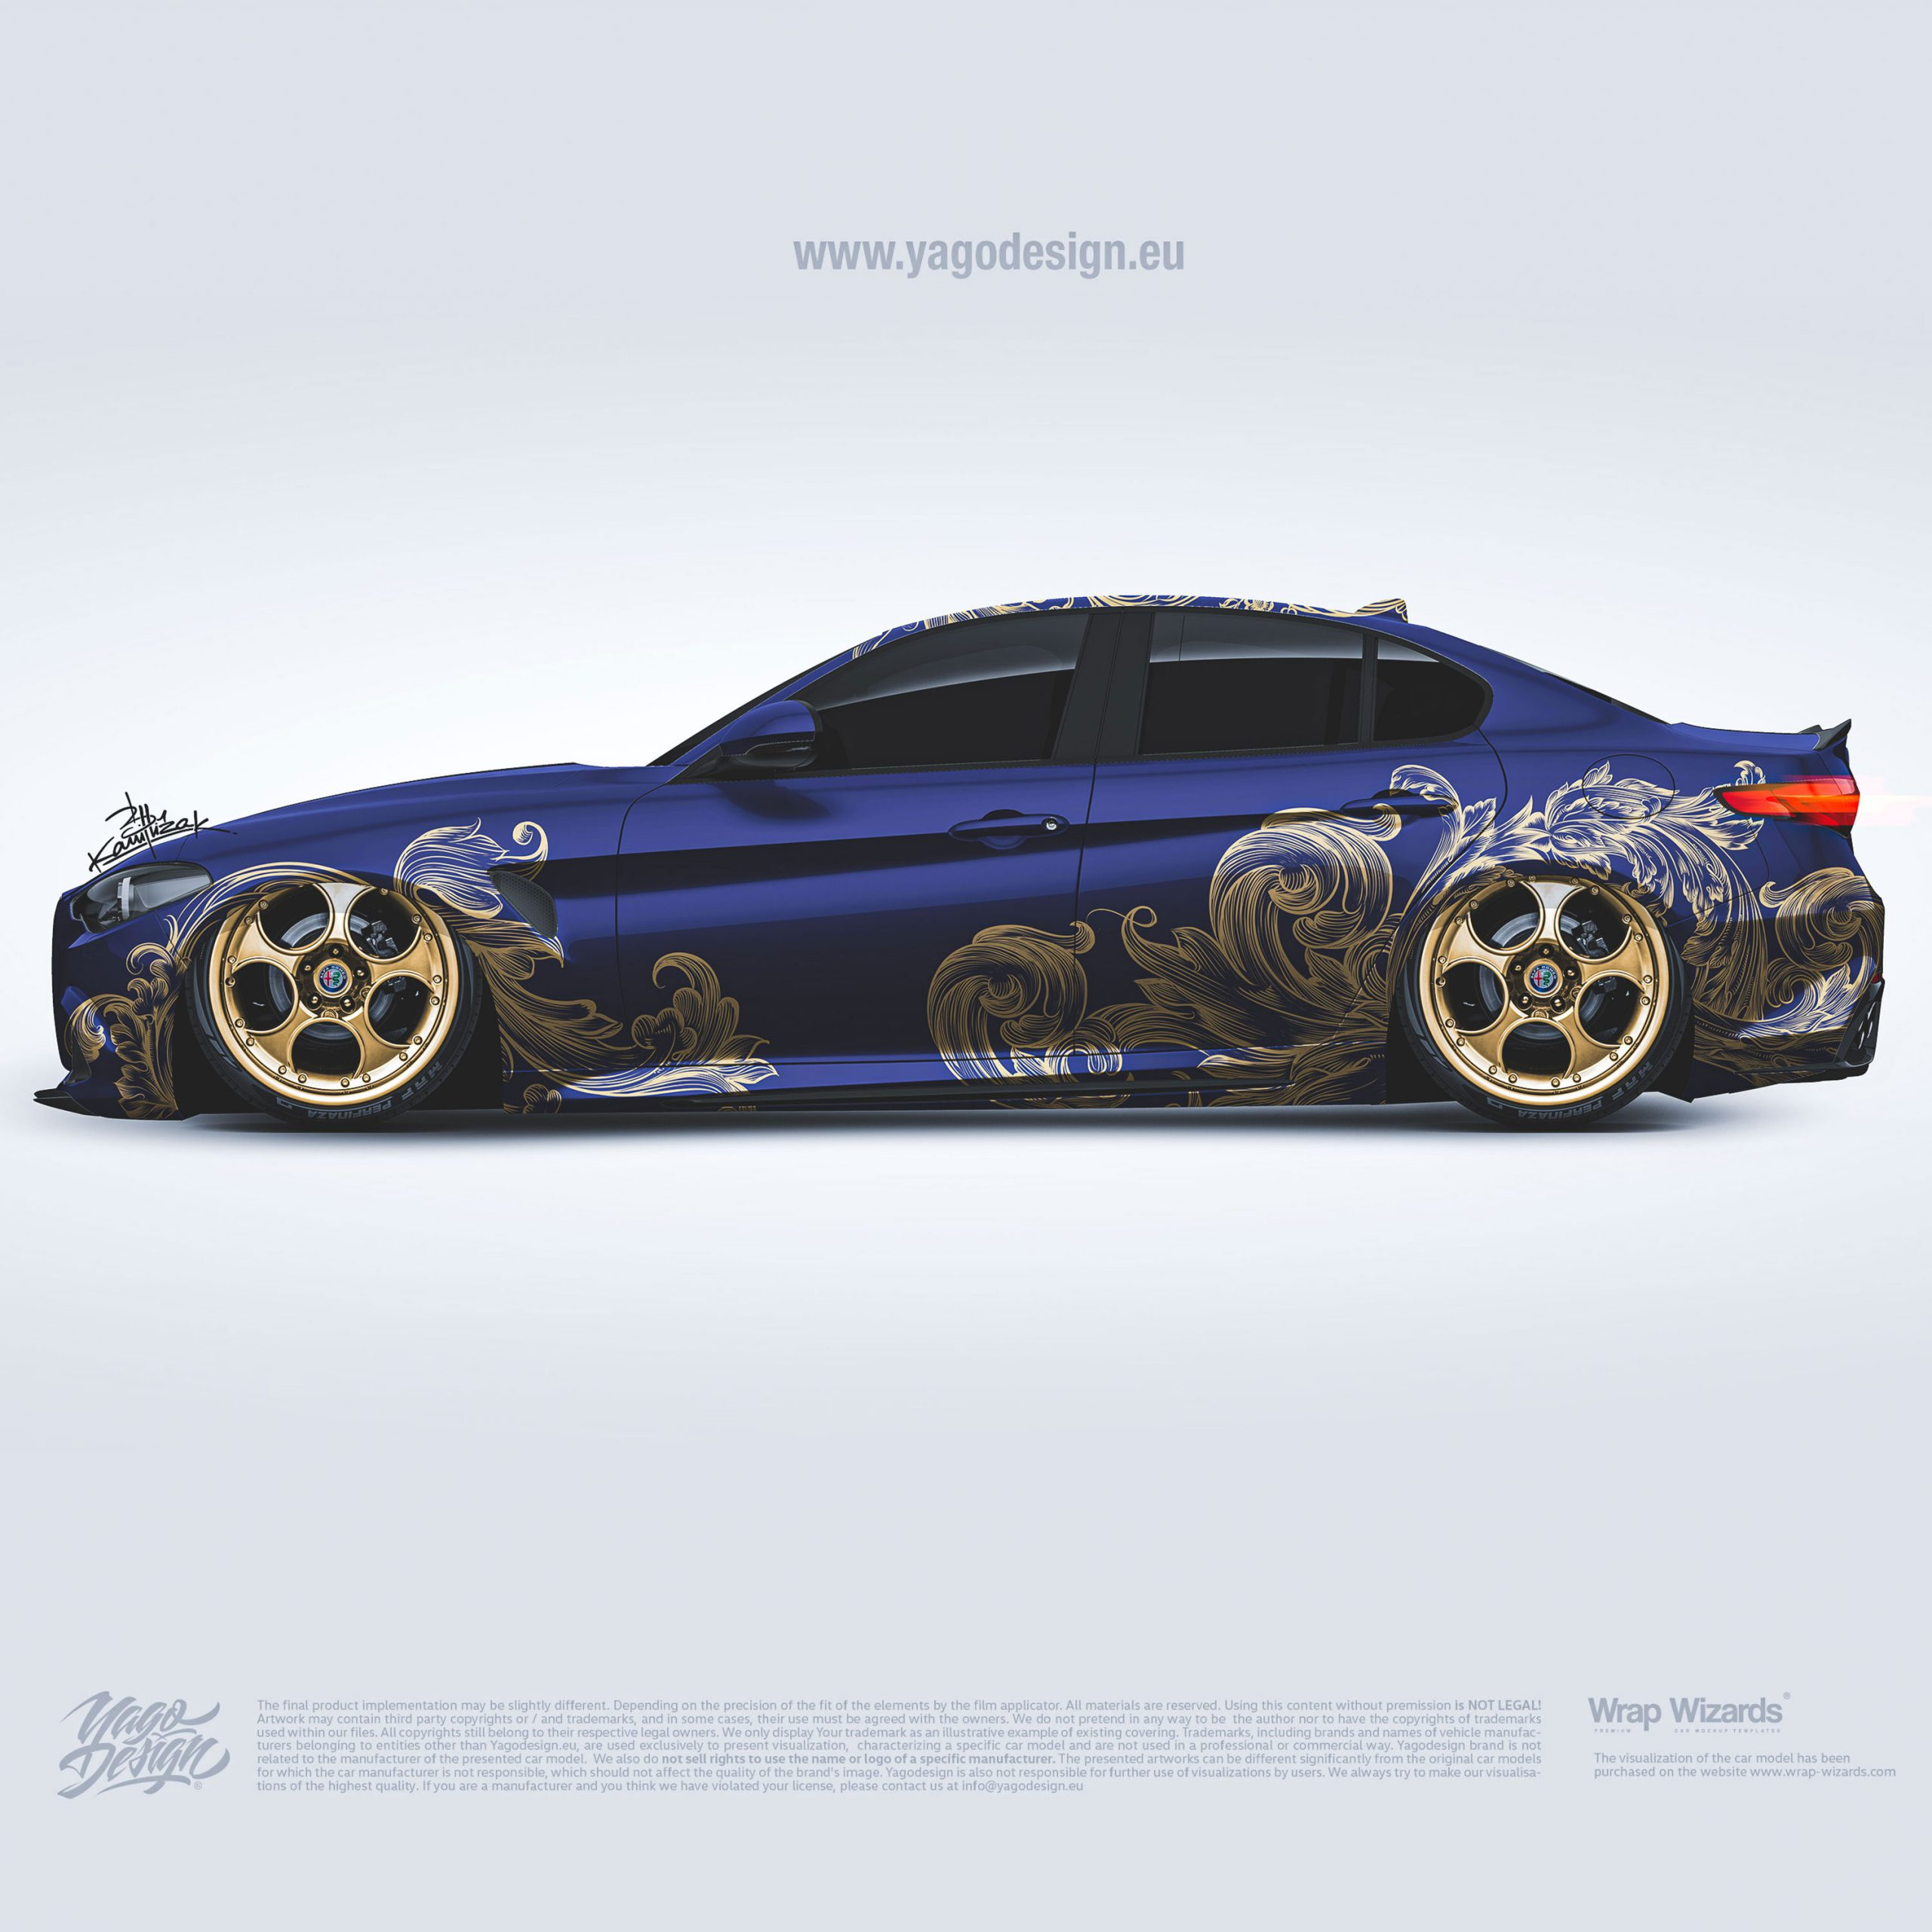 Alfa-Romeo-GiulliaYagodesign-Livery-Design-Car-wrapping-studio